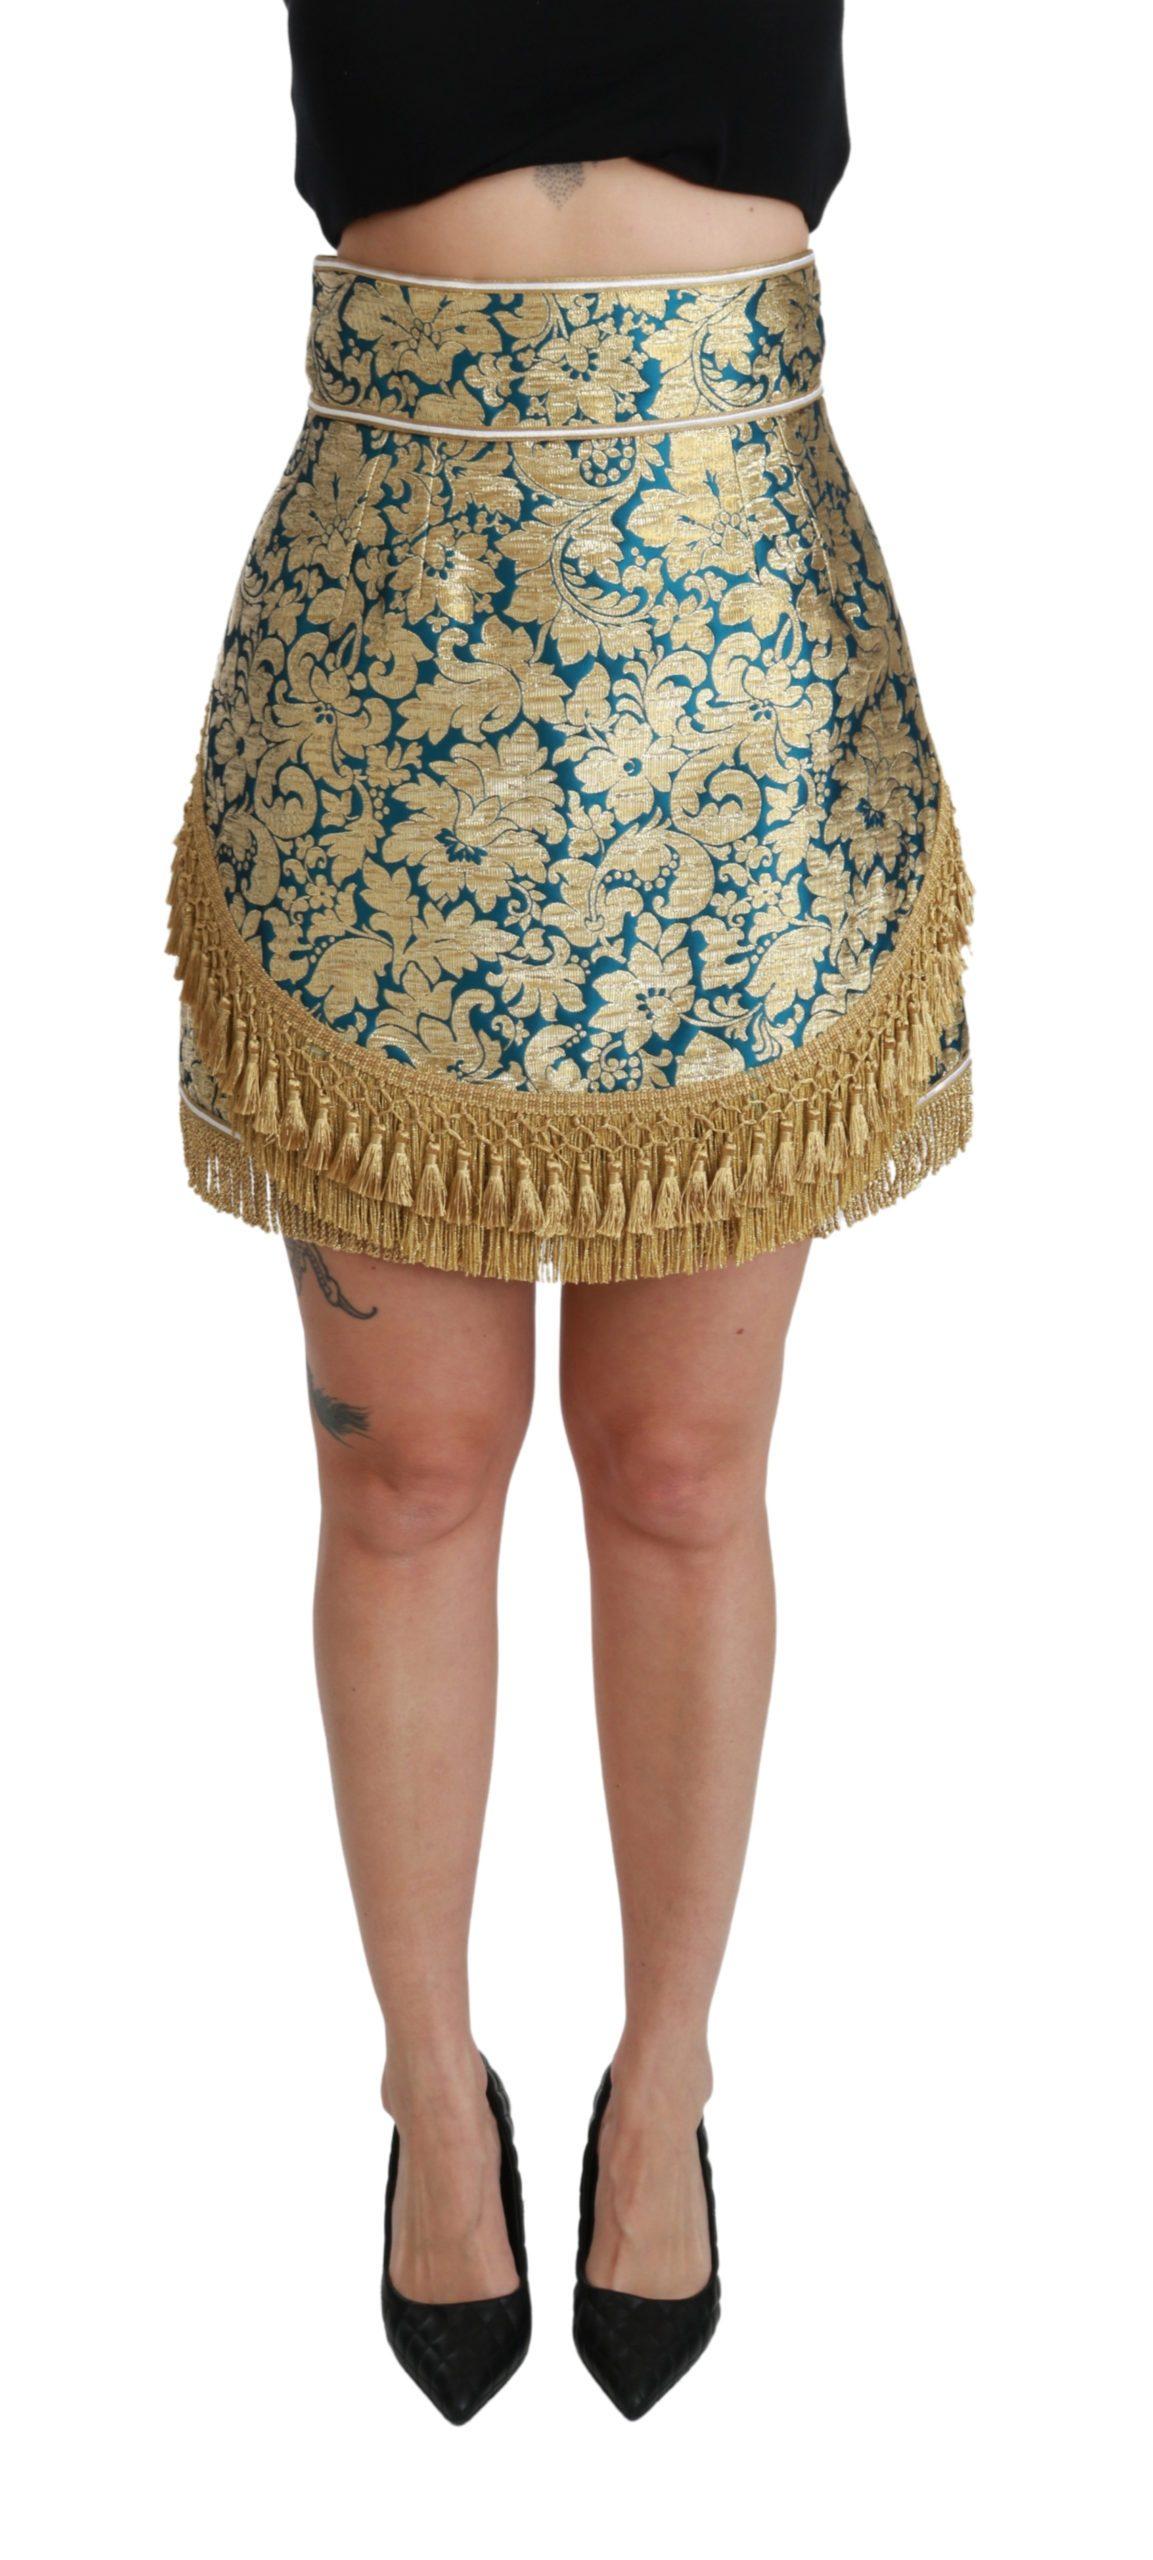 Dolce & Gabbana Women's High Waist Jacquard Tassel Skirt Gold SKI1425 - IT38|XS